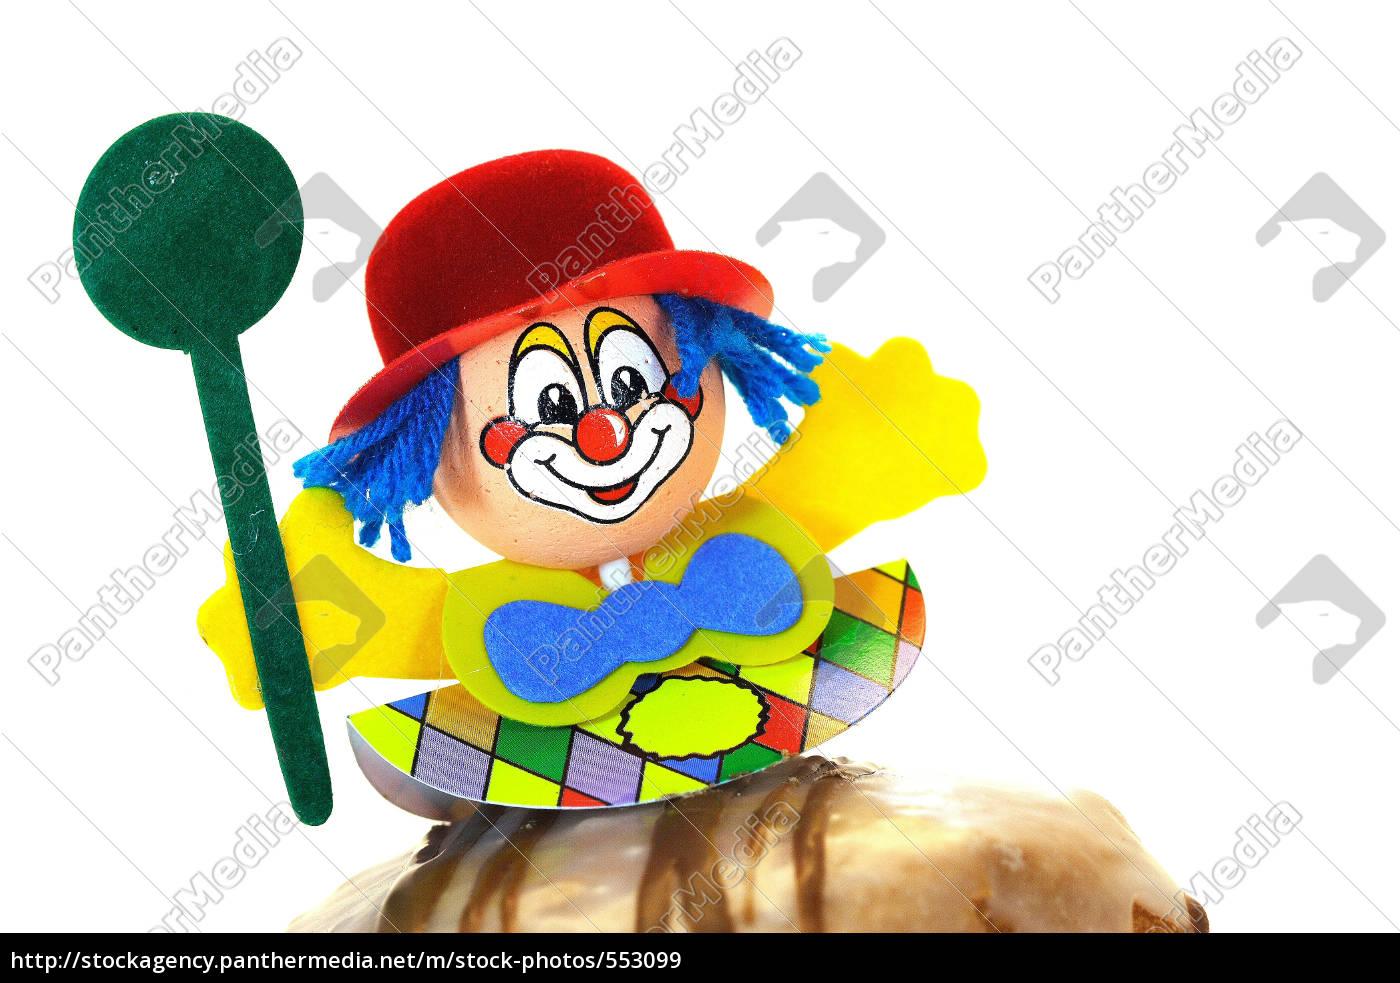 laughing, clown - 553099